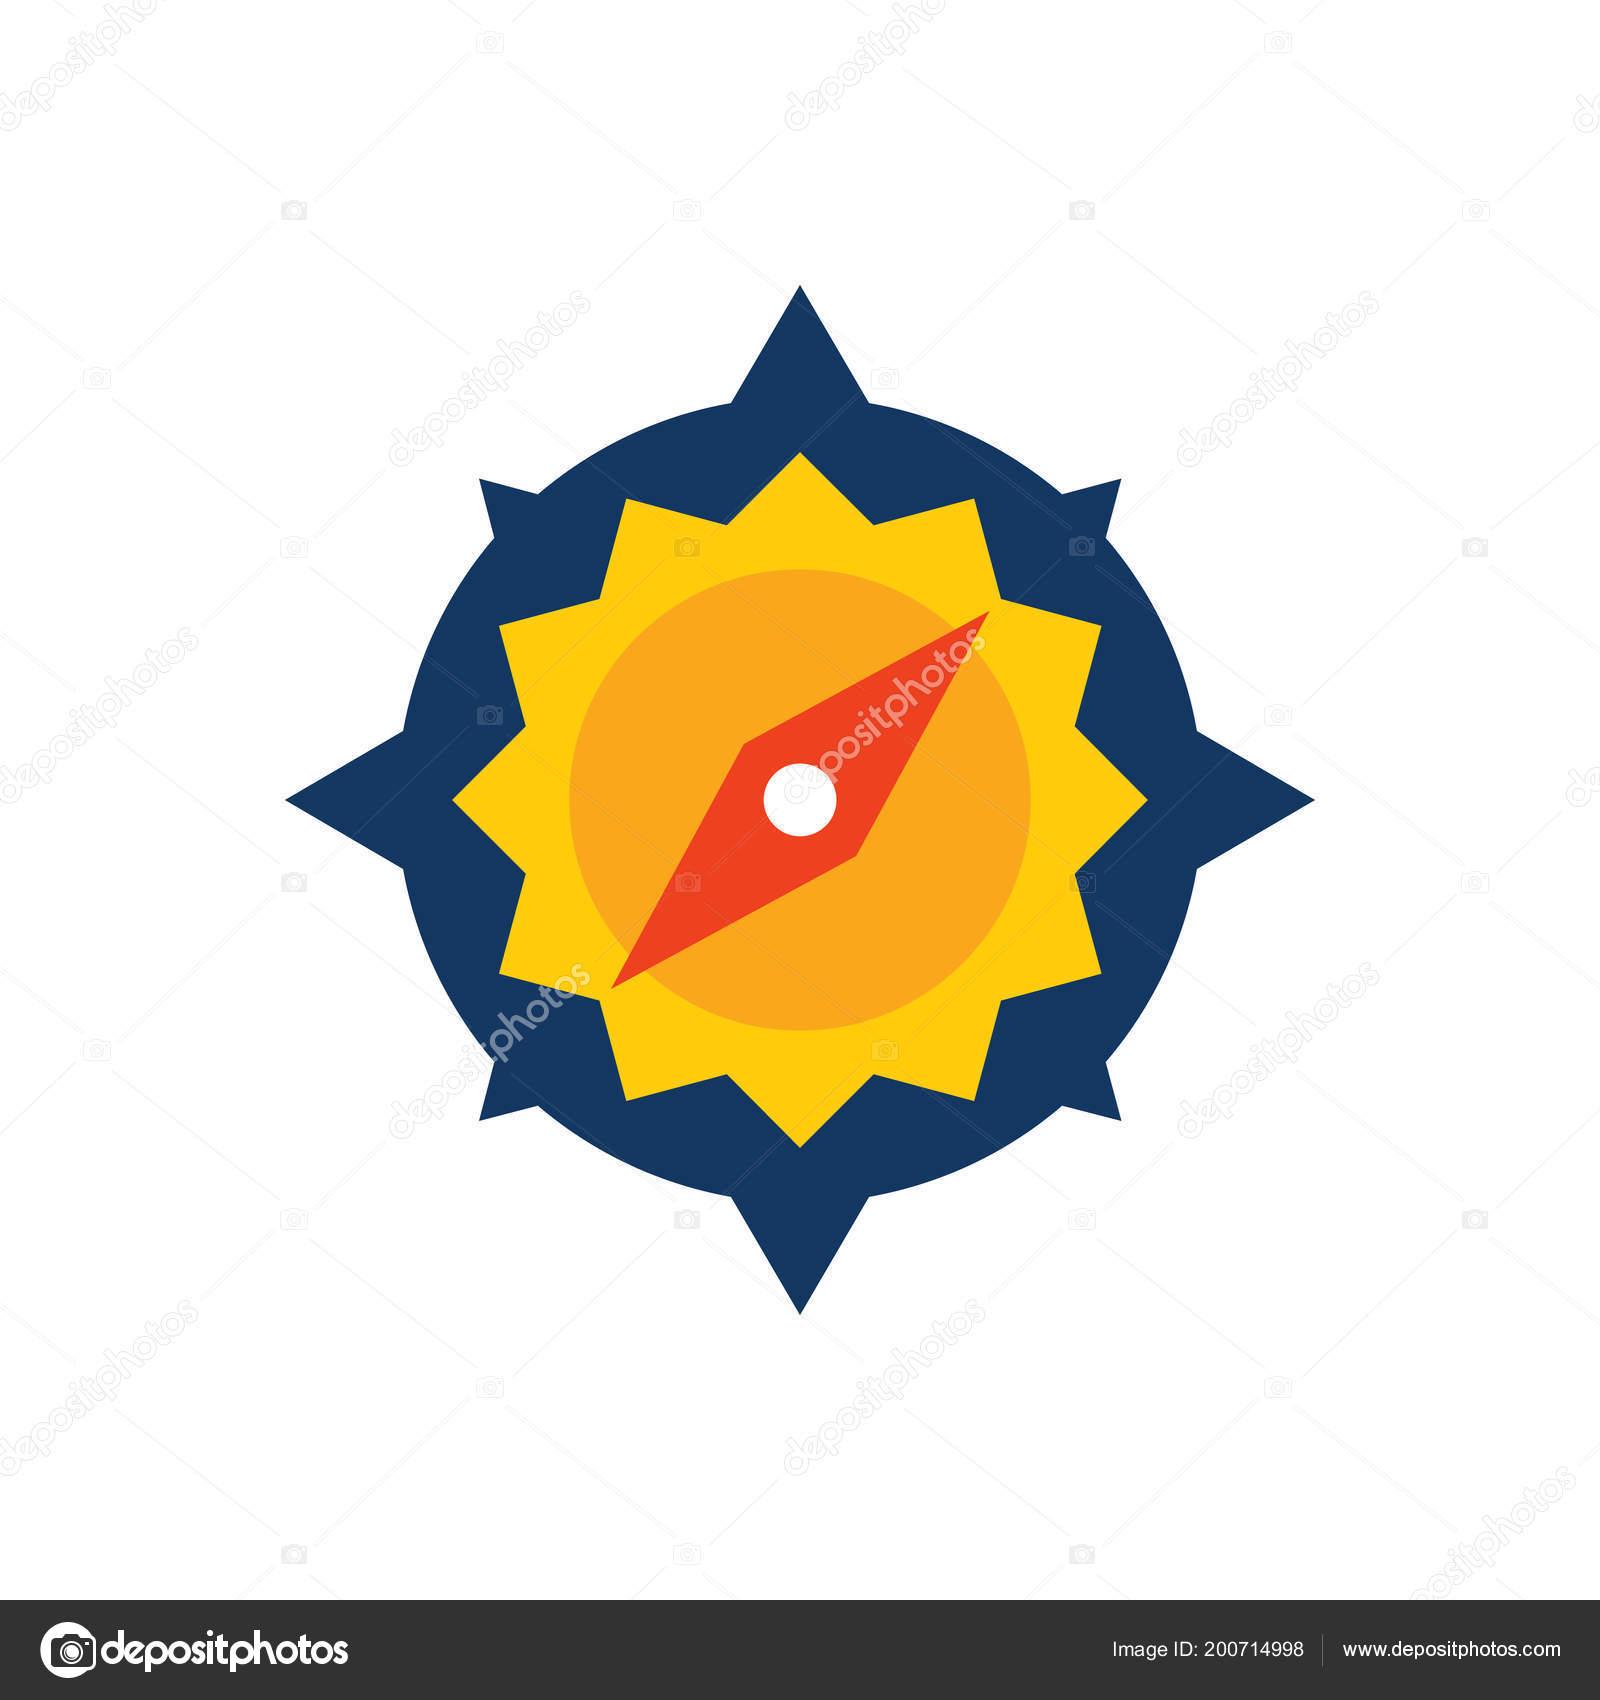 b9aad87d9d Ήλιος Πυξίδα Εικονίδιο Σχεδιασμός Λογοτύπου — Διανυσματικό Αρχείο ...